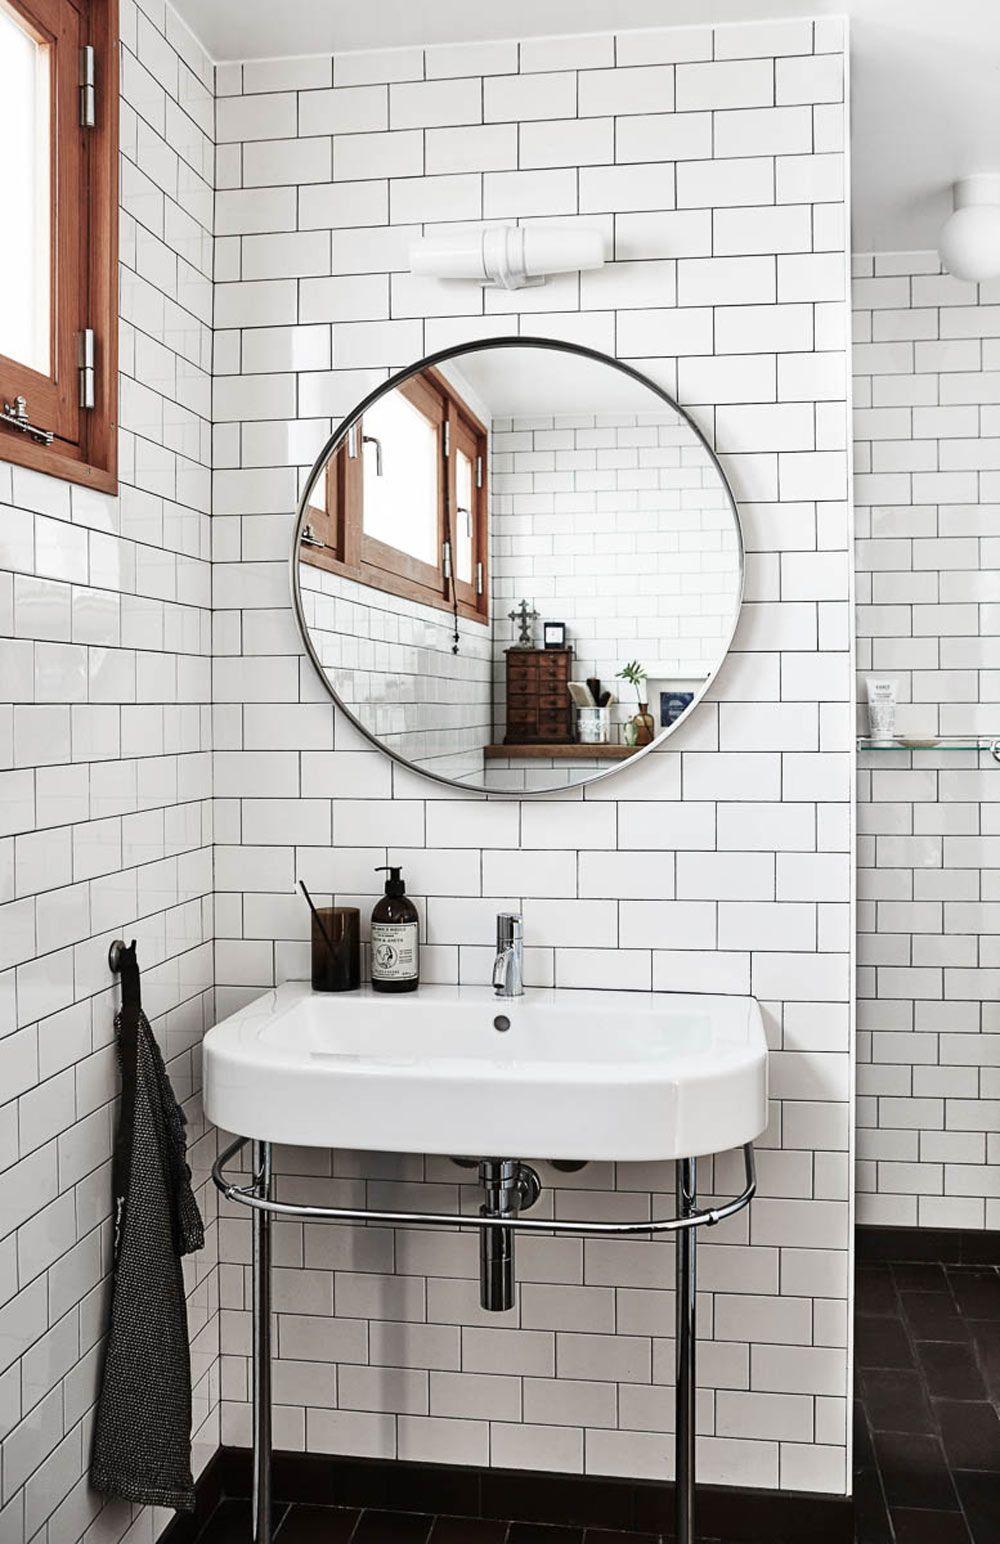 20+ Beautiful Scandinavian Interior Design Ideas You Must Know ...